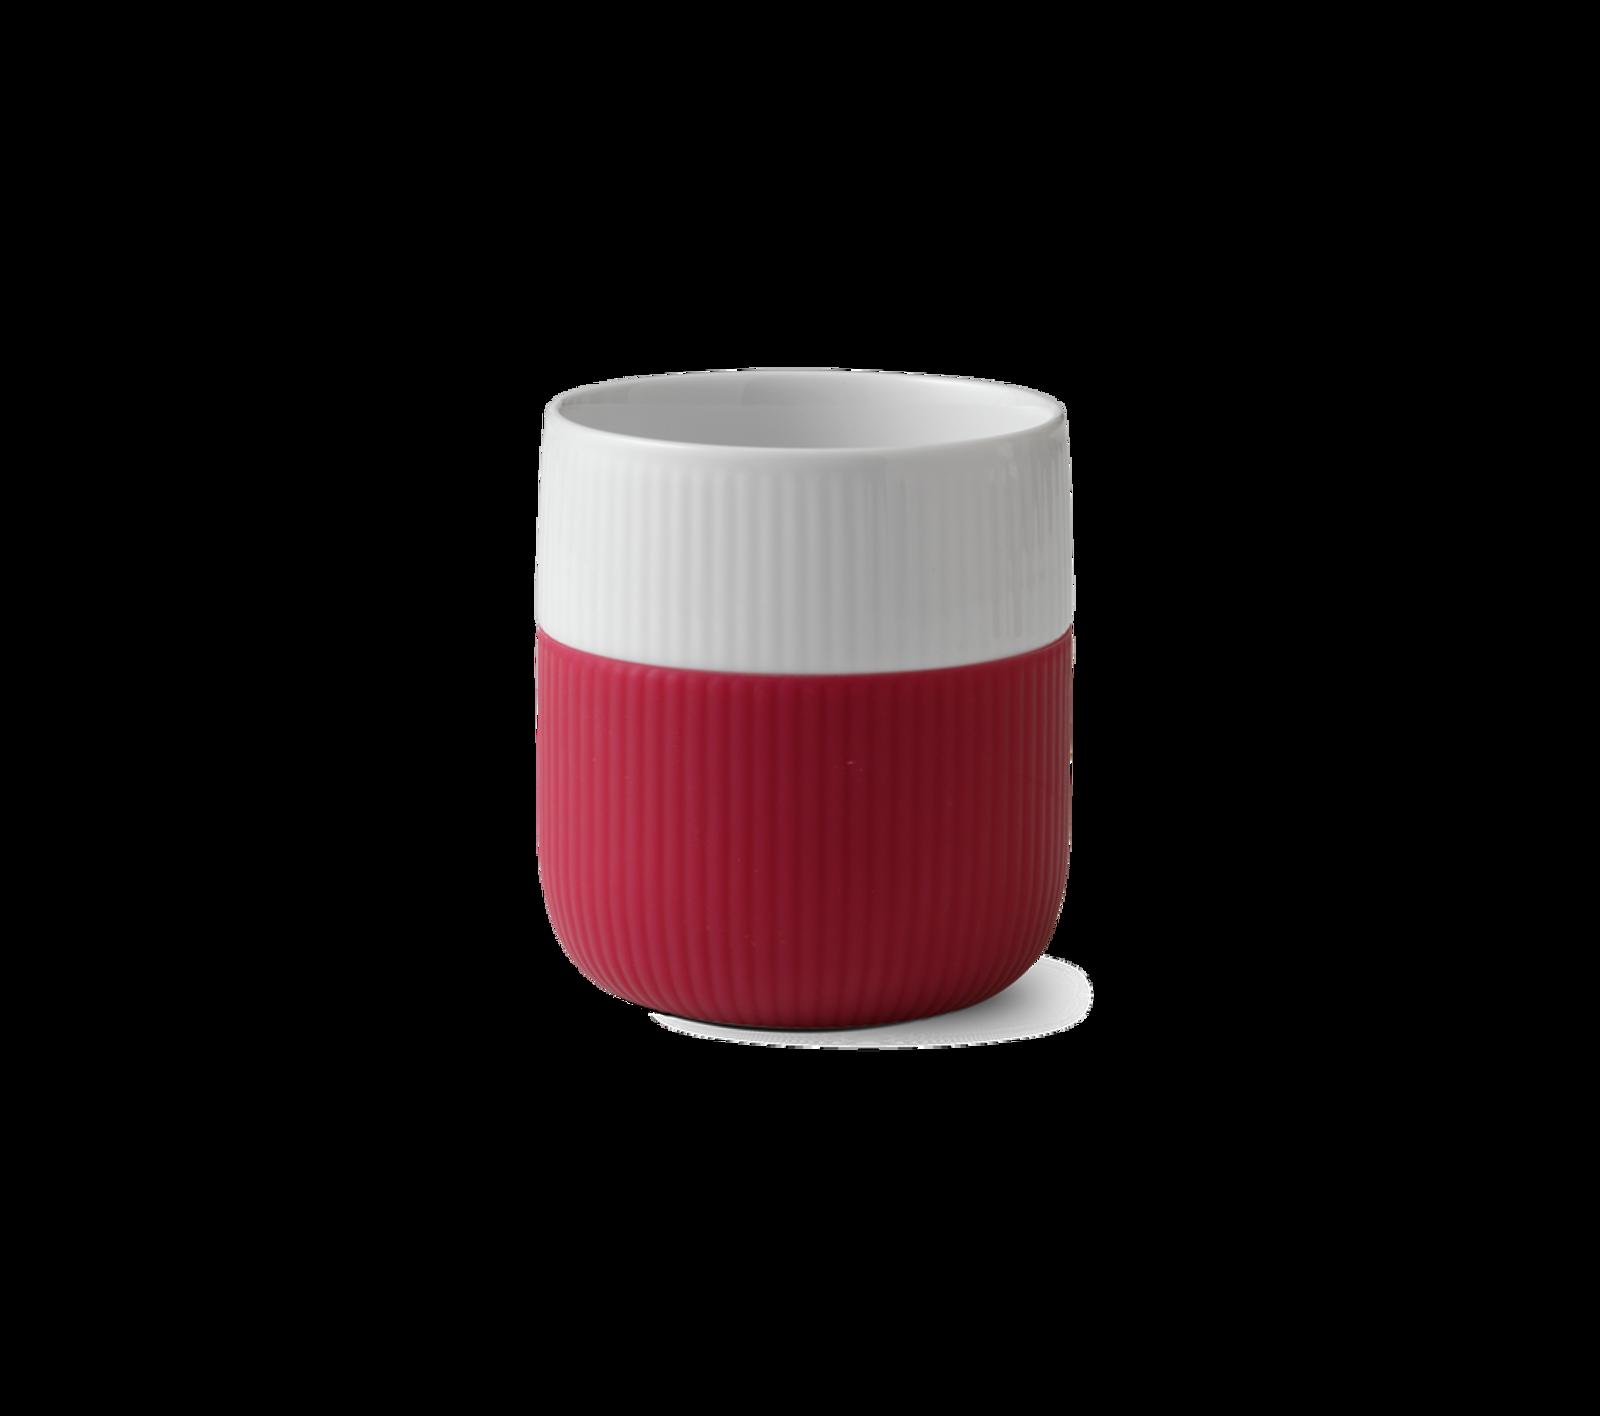 Royal Copenhagen Fluted Contrast Mug - Raspberry